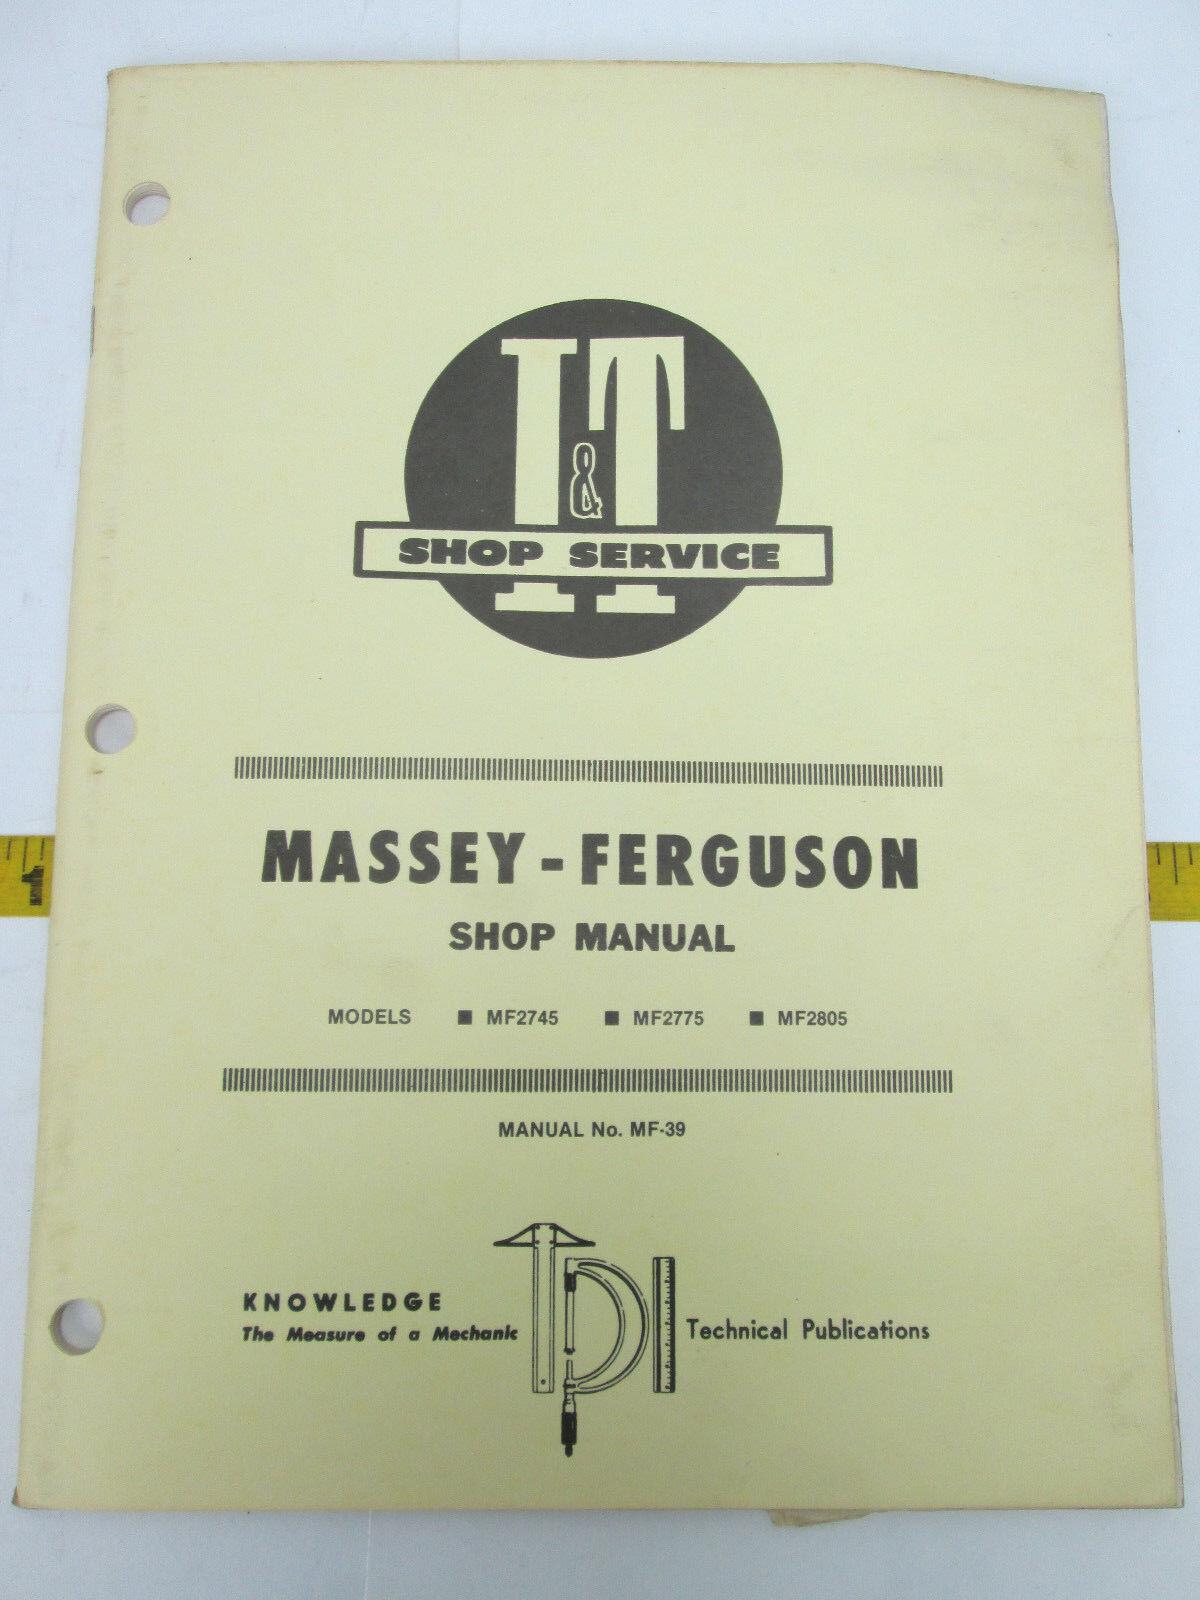 Massey Ferguson Models Mf2745 Mf2775 Mf2805 I&t Shop Service Manual ...